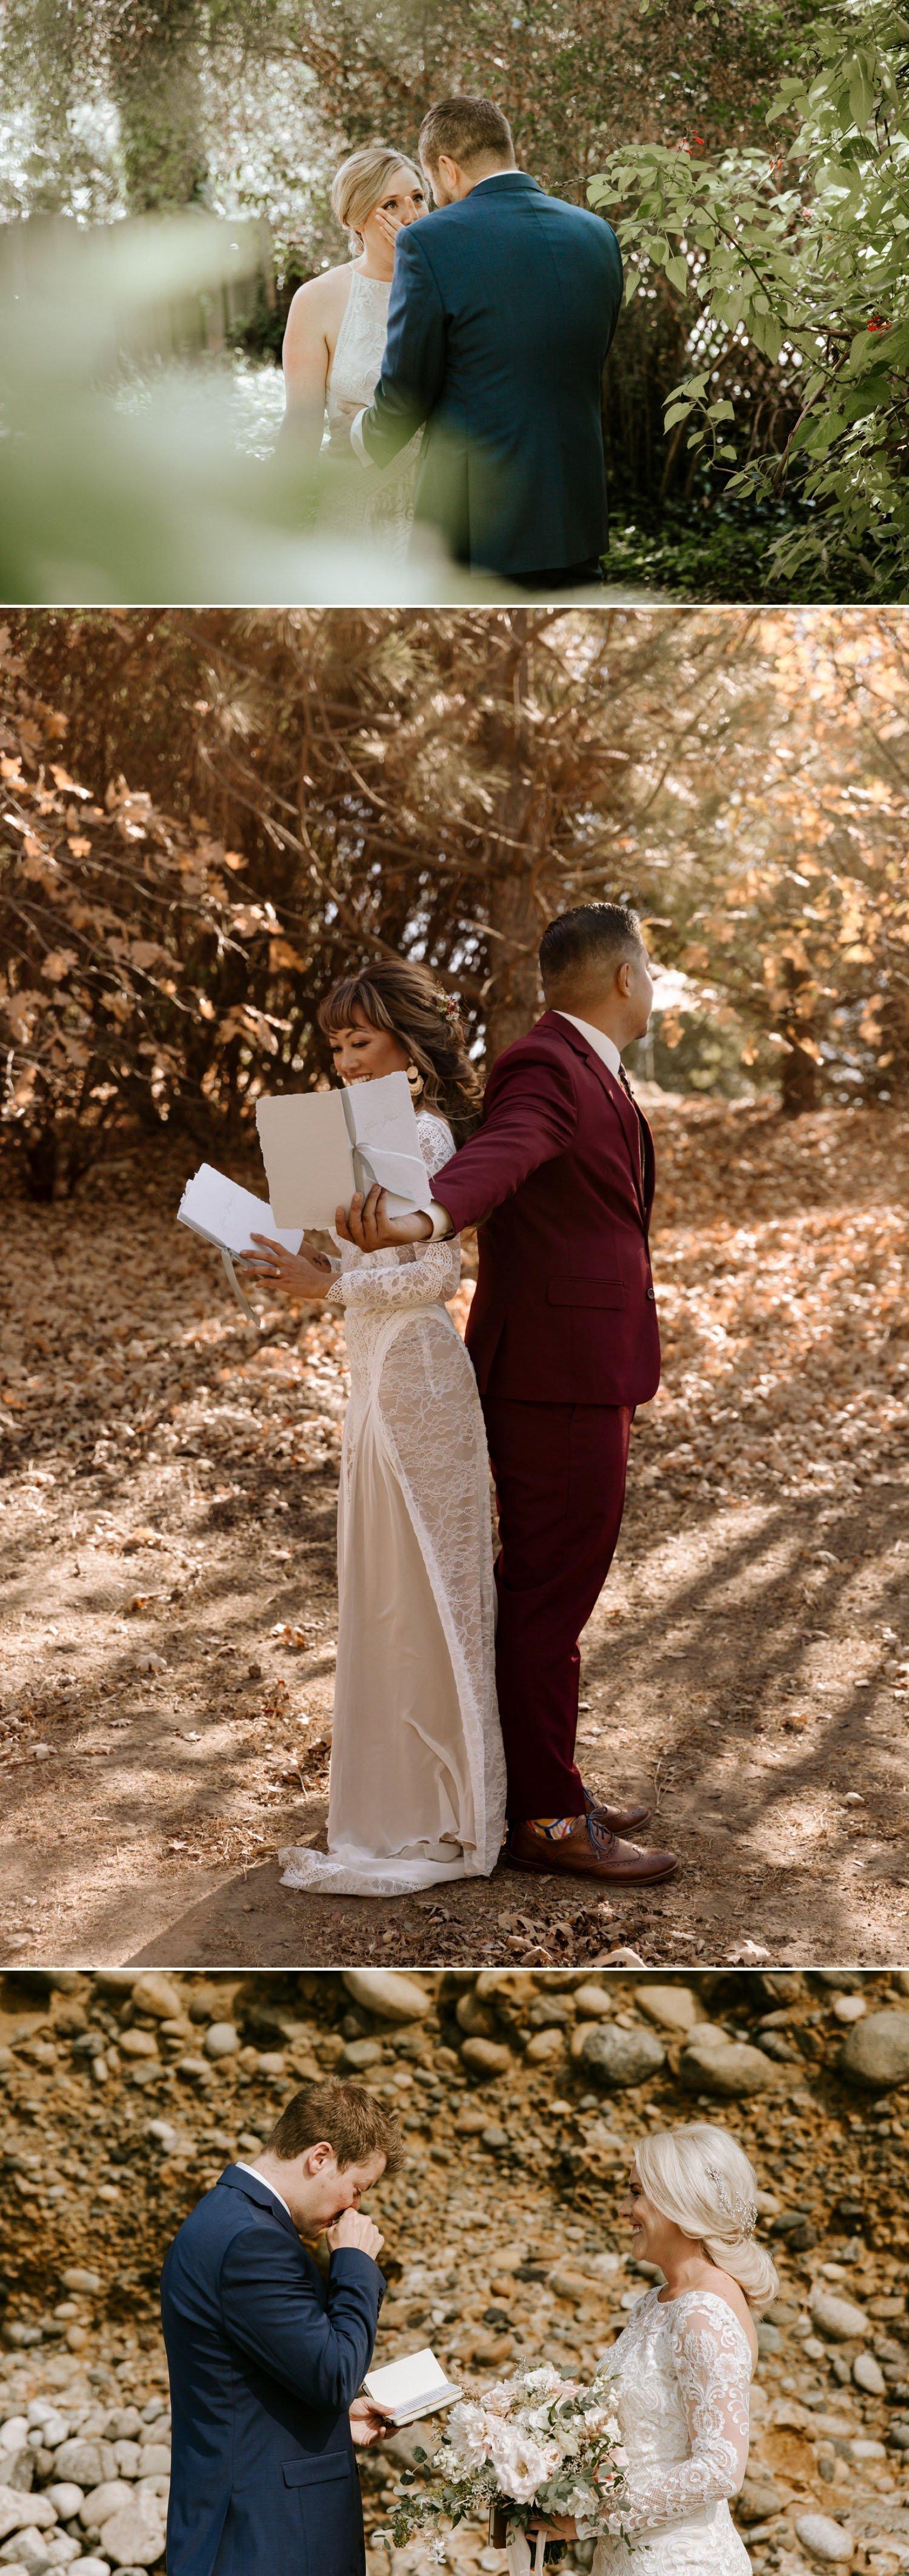 San Diego Wedding Photographer Paige Nelson, Destination Intimate Wedding and Elopements